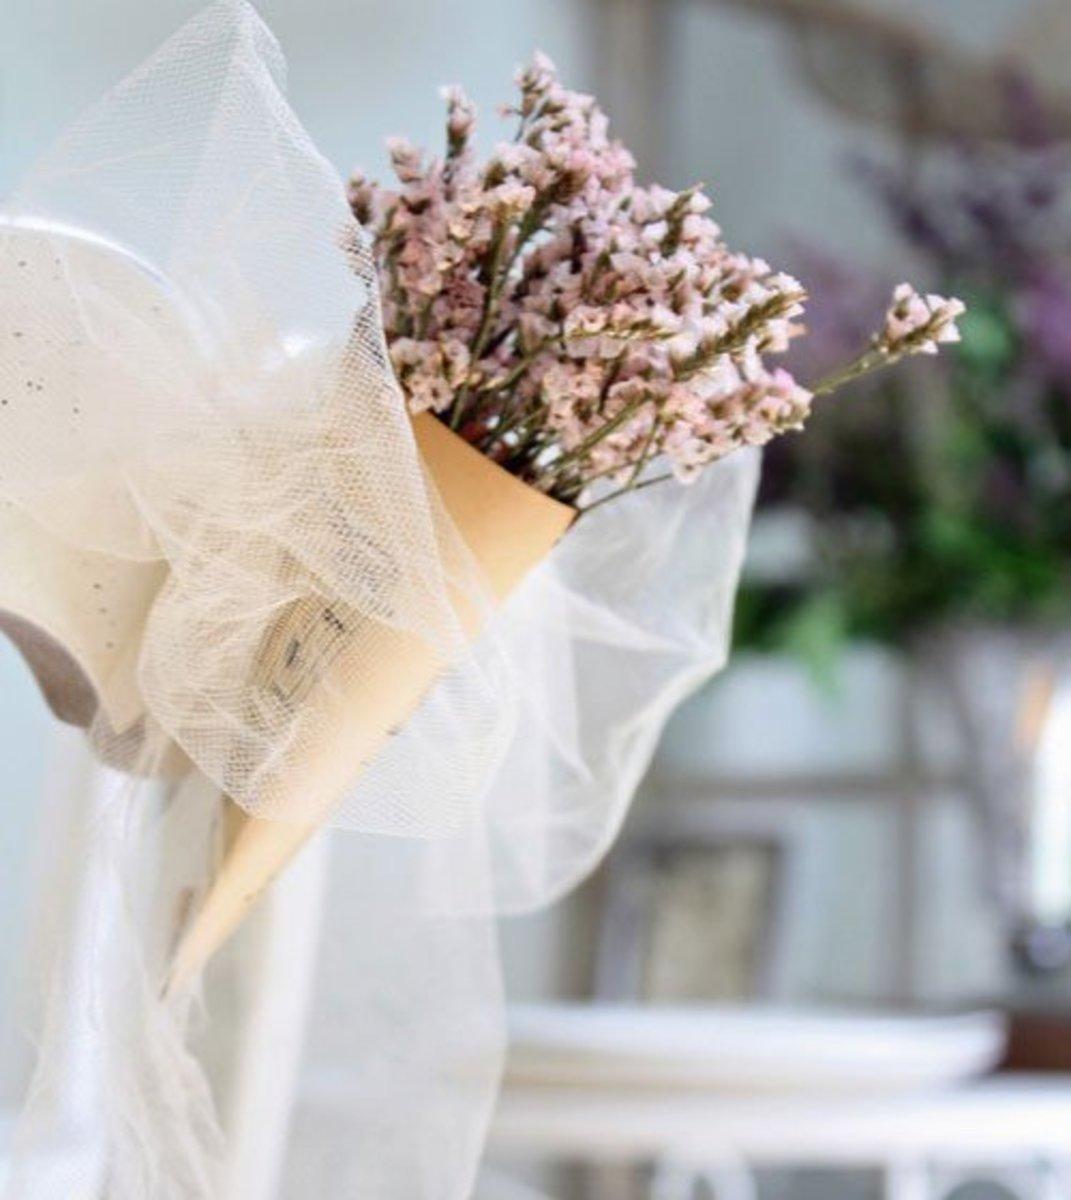 DIY Wedding Table Decoration Ideas   Delicate Chair Décor